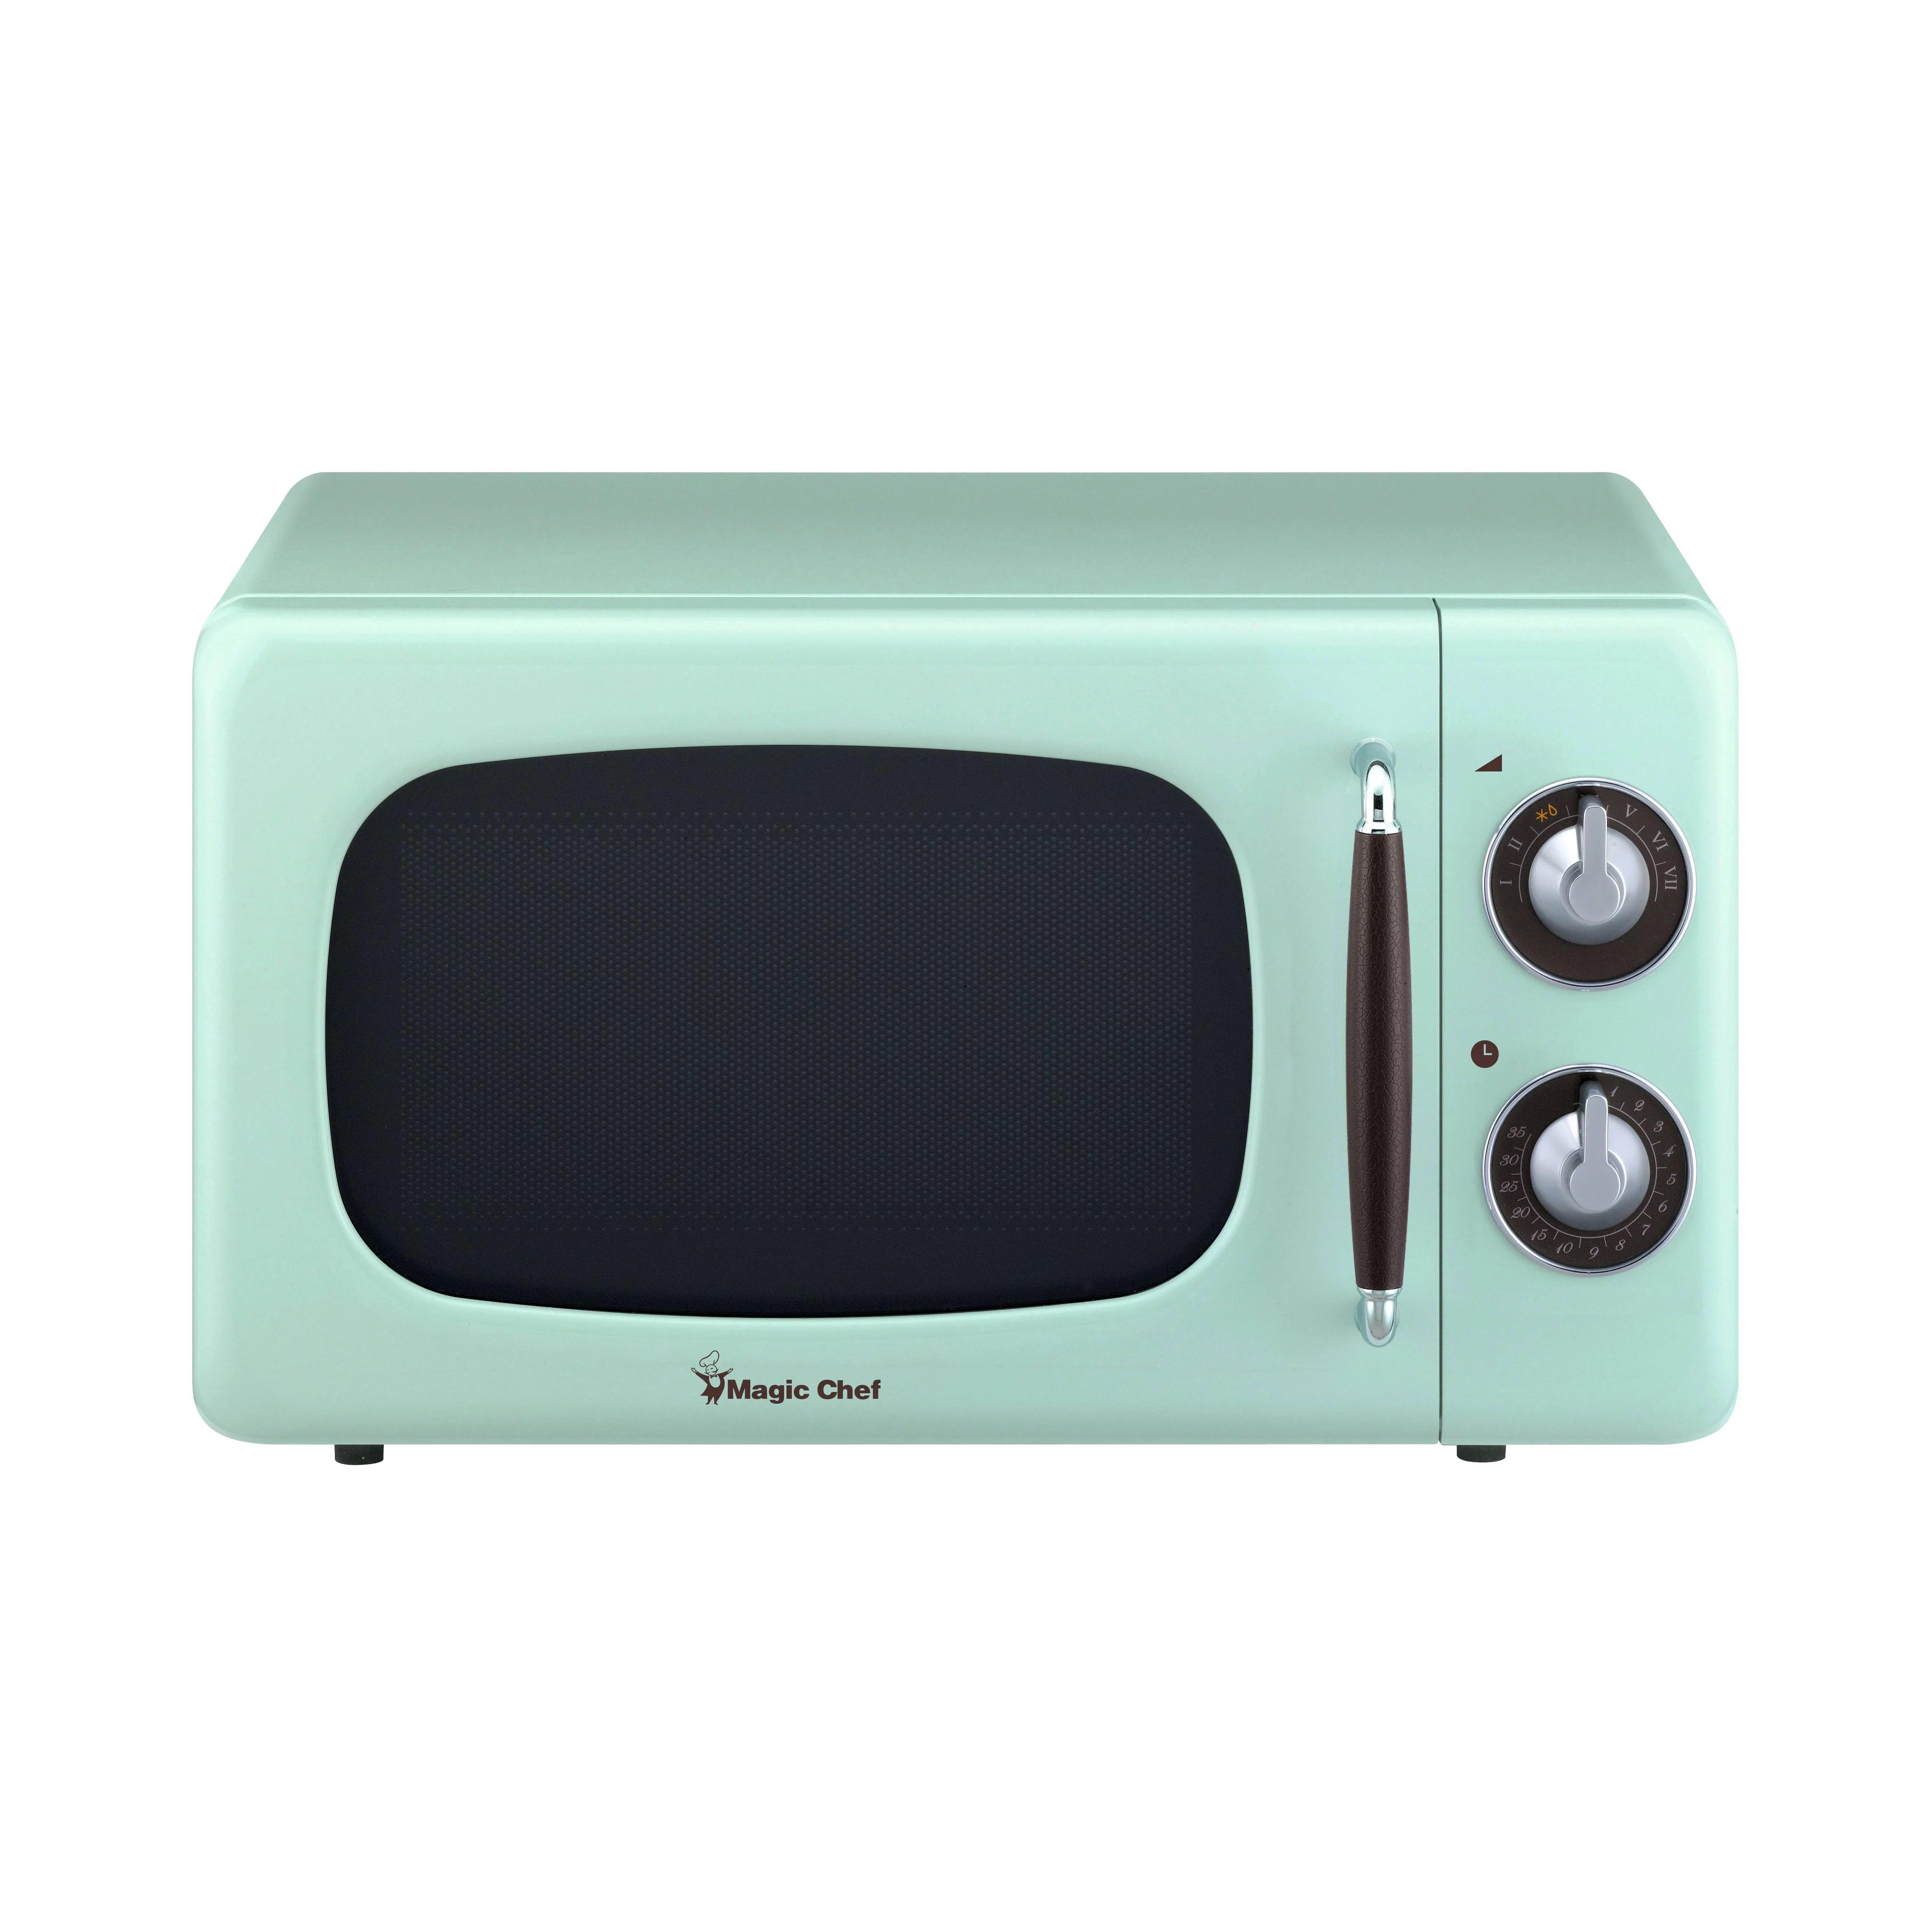 0 7 cu ft 700 watt countertop microwave in mint green